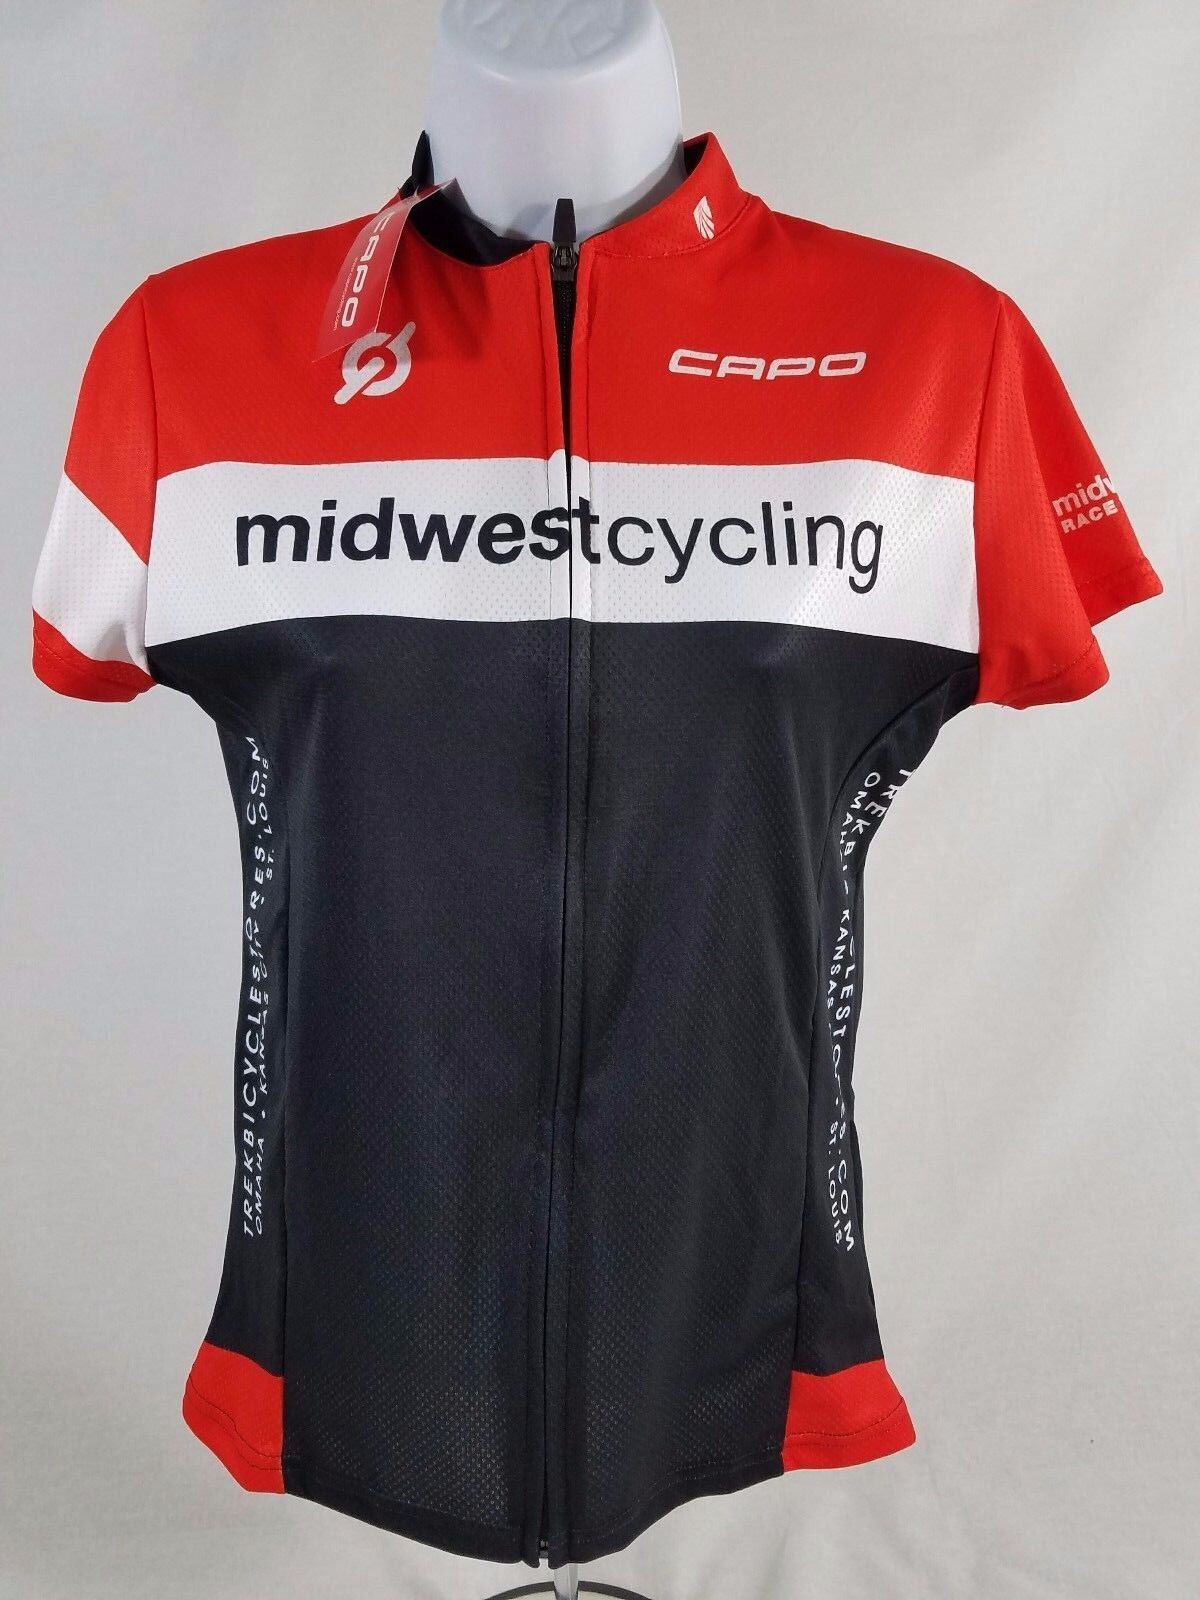 Capo Trek Store Club Women's Cycling Jersey SIZE Small 1a